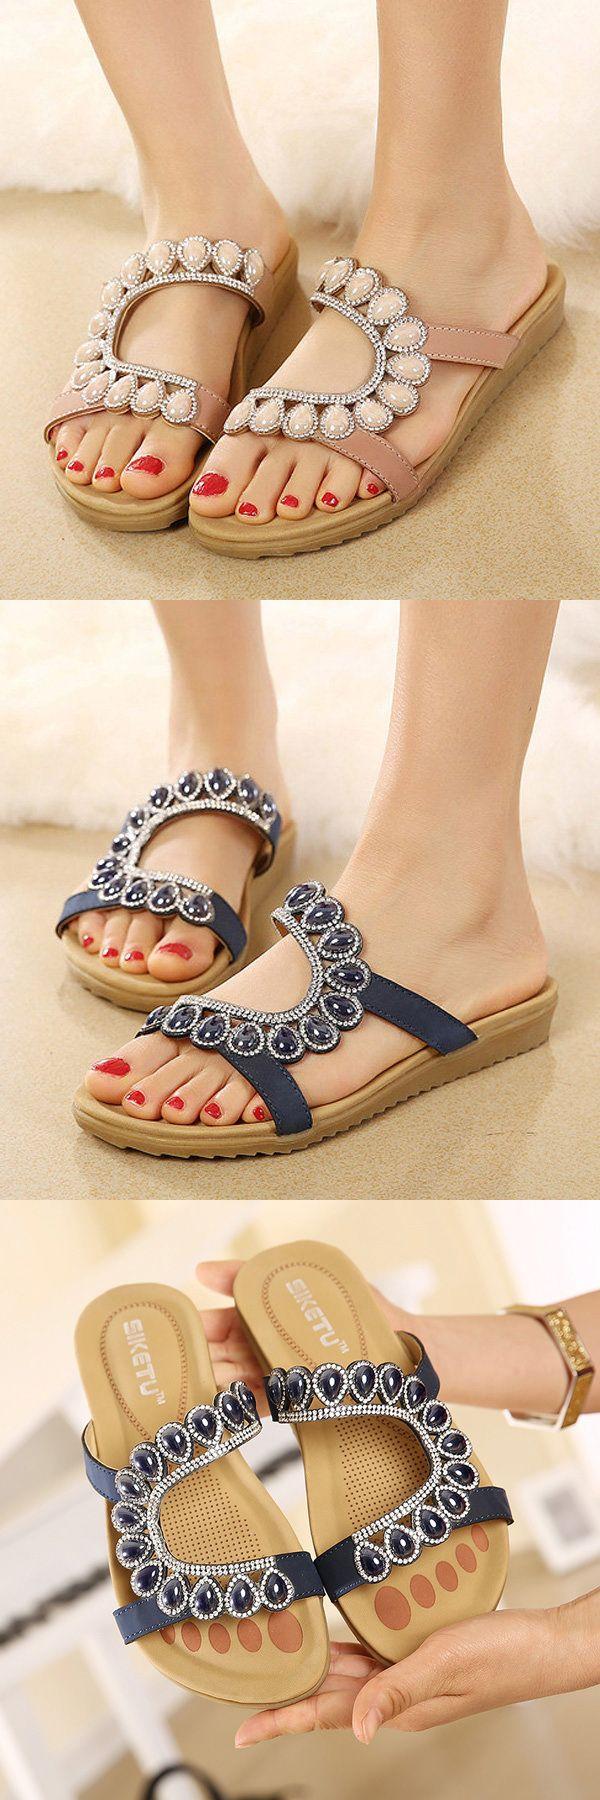 US$18.94 Bead Shiny Crystal Peep Toe Flat Lazy Sandals